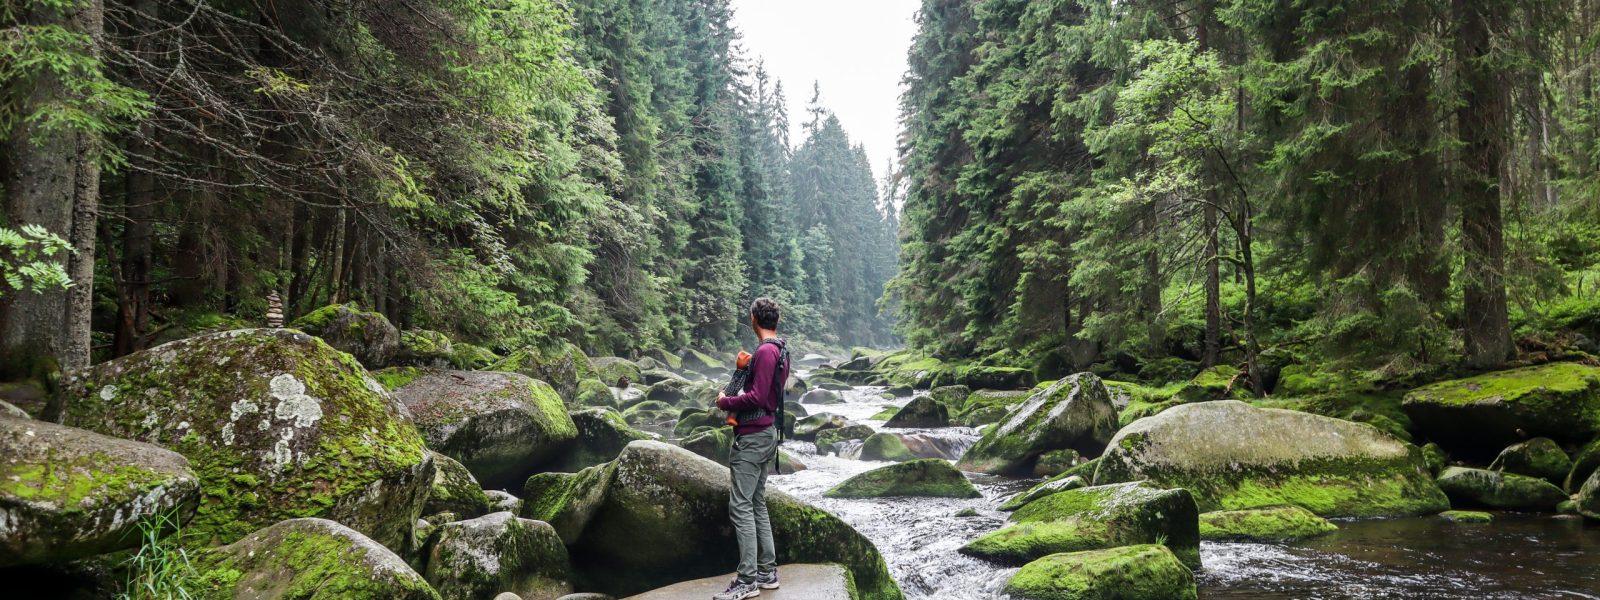 Bezoek Šumava National Park, het grootste park van Tsjechië